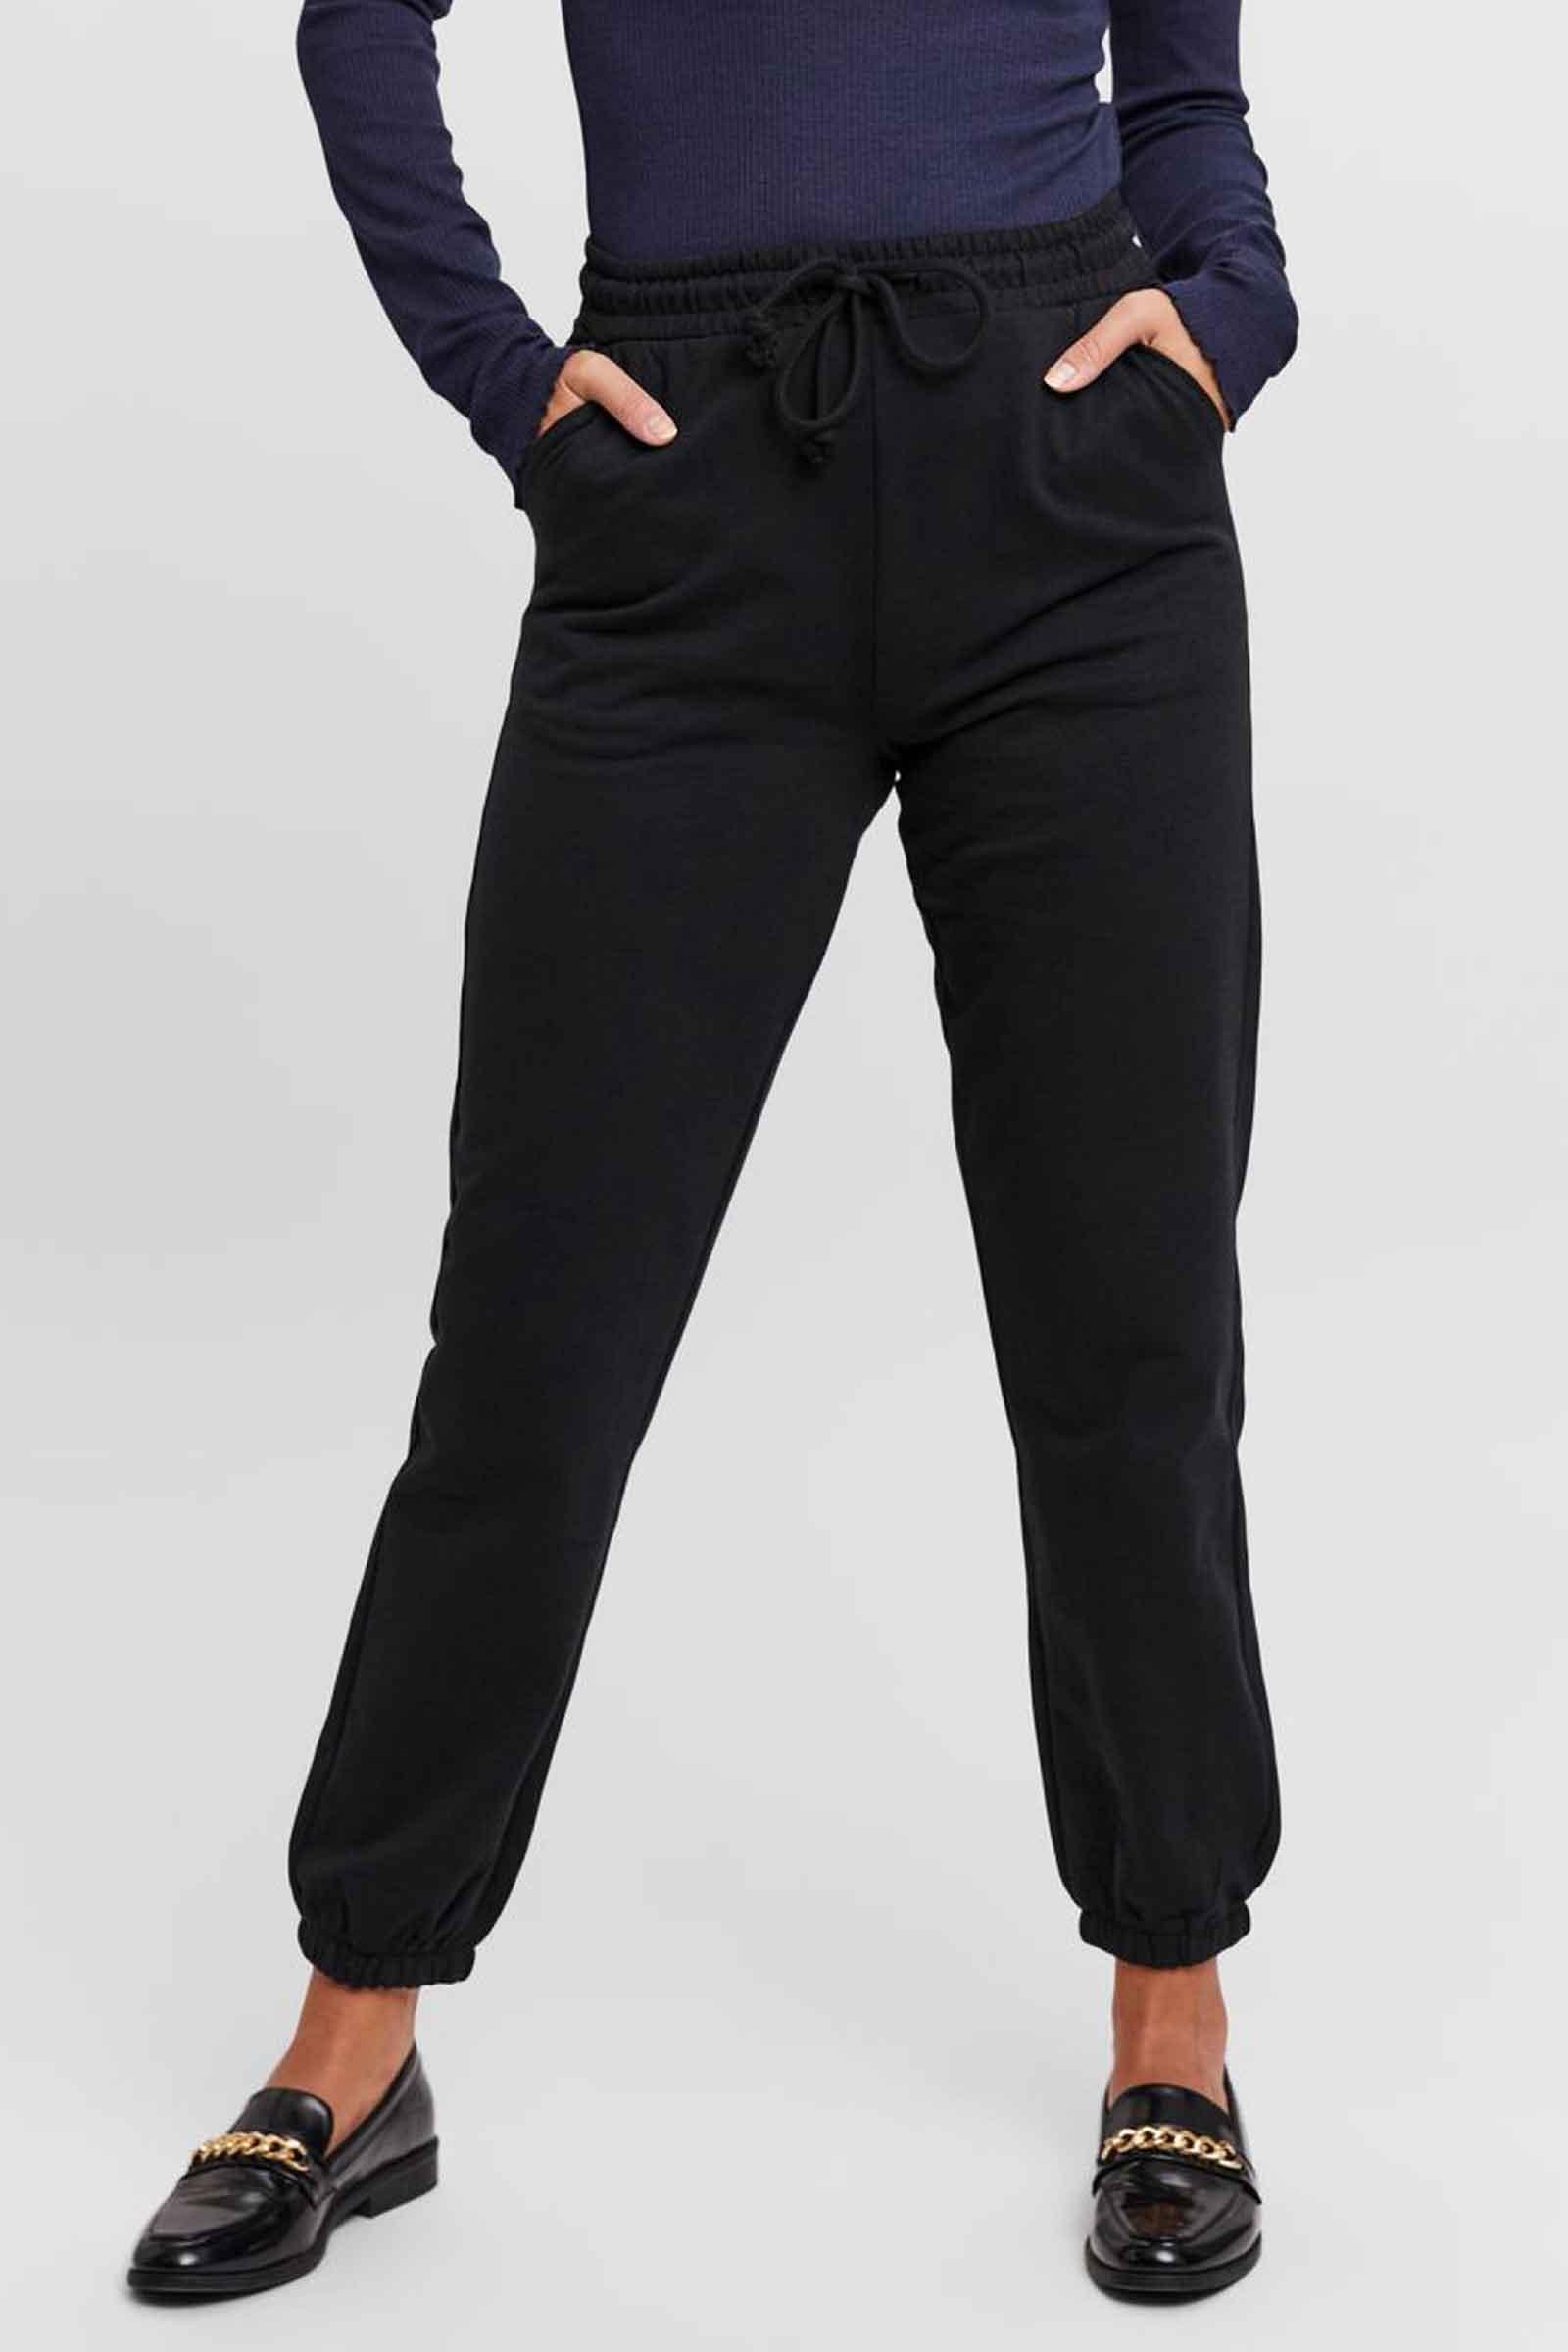 Pantalone Donna VERO MODA   Pantalone   10252961Black